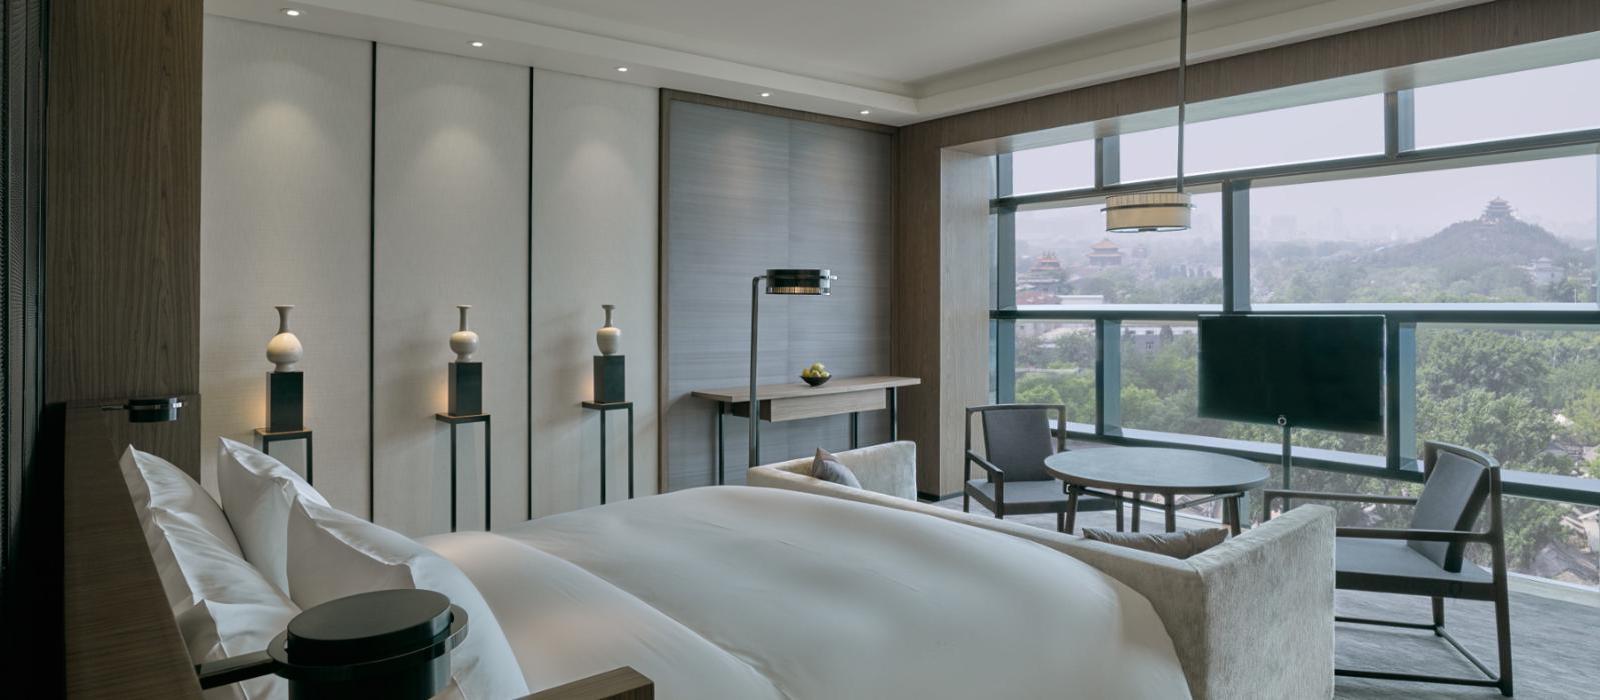 璞瑄酒店(The PuXuan Hotel and Spa)【 北京,中国】 酒店  www.lhw.cn